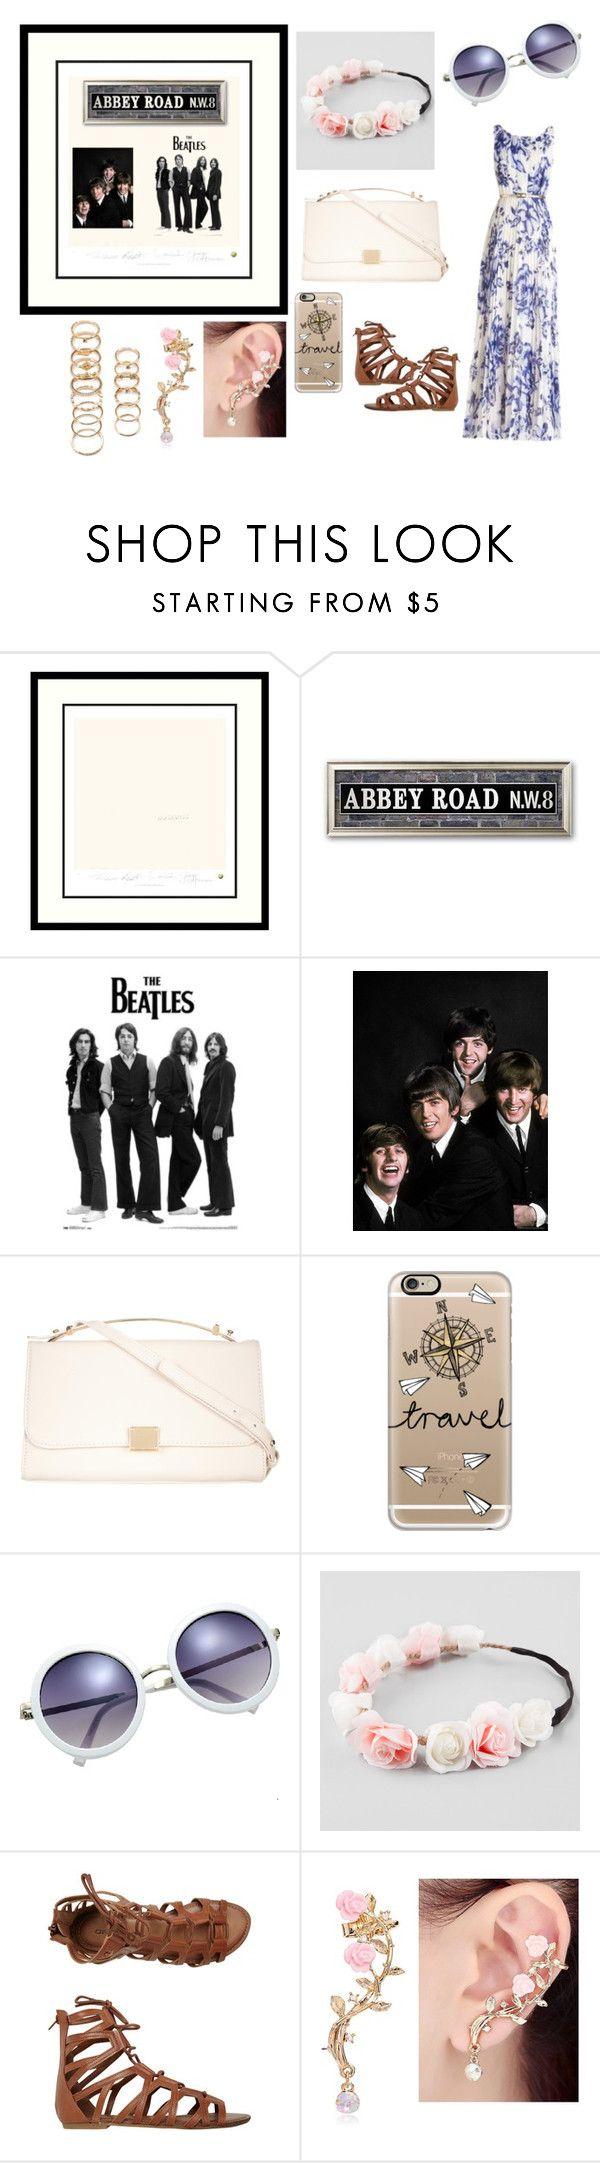 """The Beatles"" by alejandra-rodriguez-villalpando ❤ liked on Polyvore featuring Amanti Art, ZALORA, Casetify, Full Tilt, O'Neill and Forever 21"